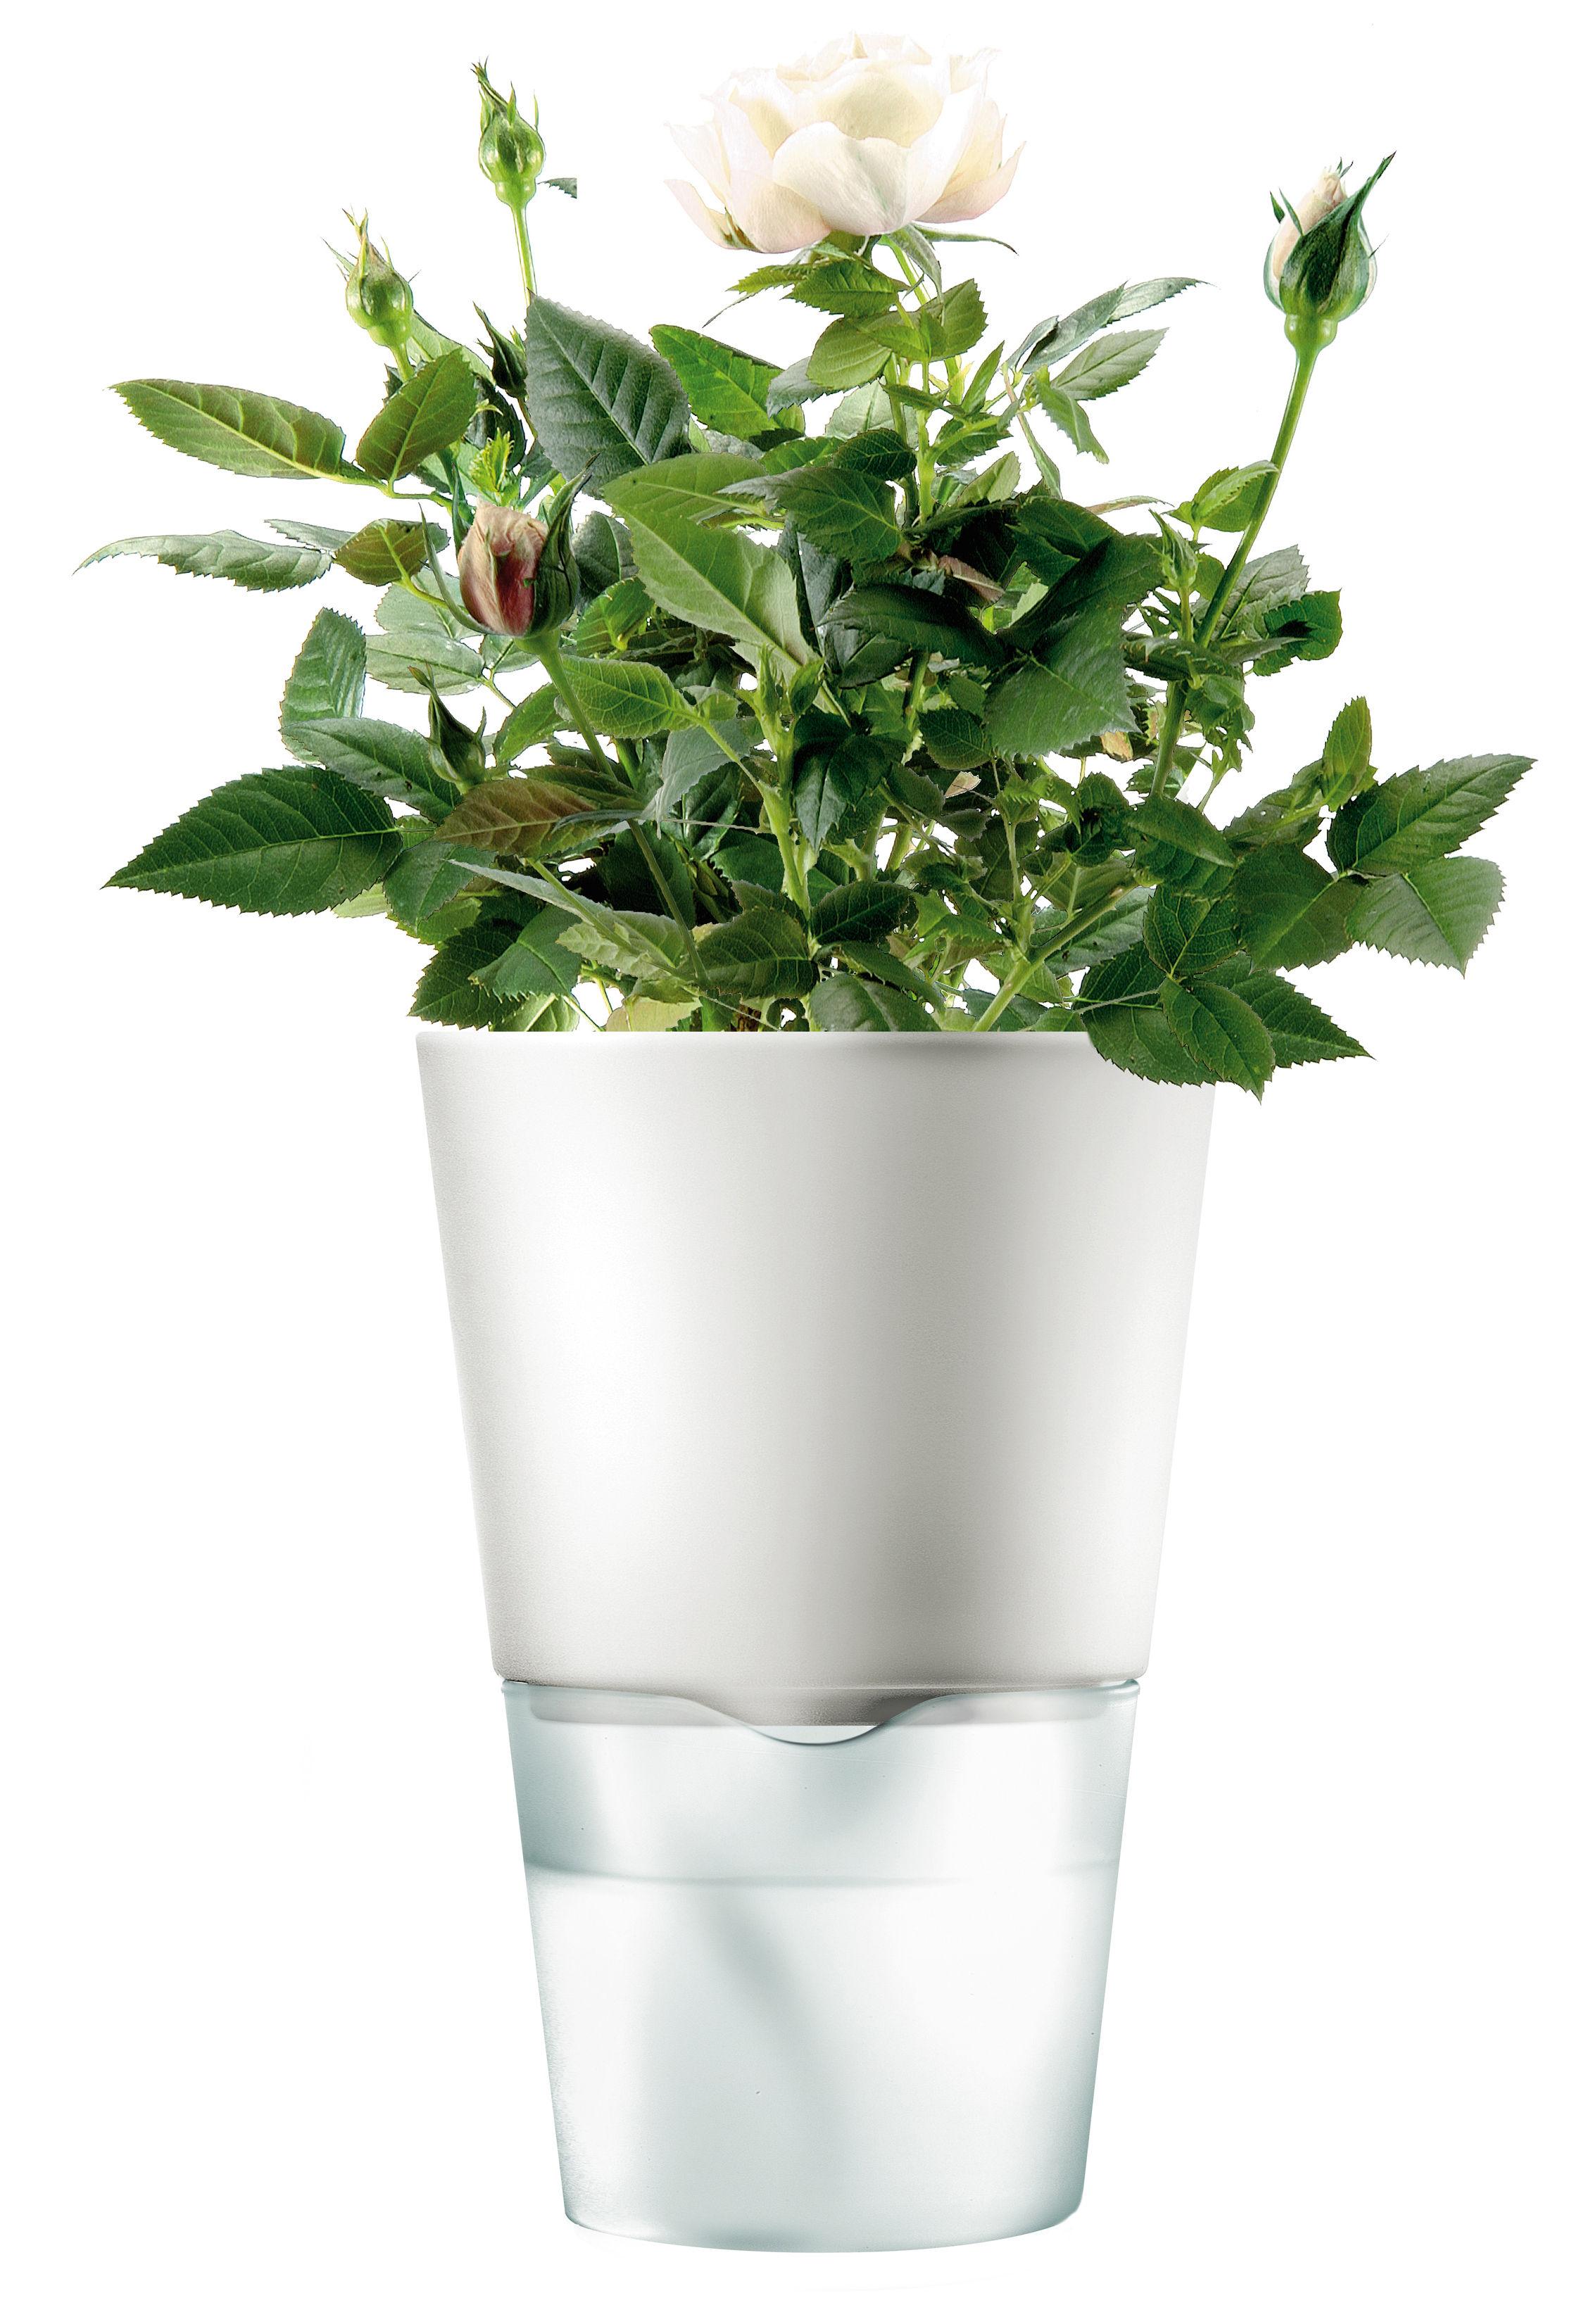 avec r serve d 39 eau flowerpot with water tank small. Black Bedroom Furniture Sets. Home Design Ideas